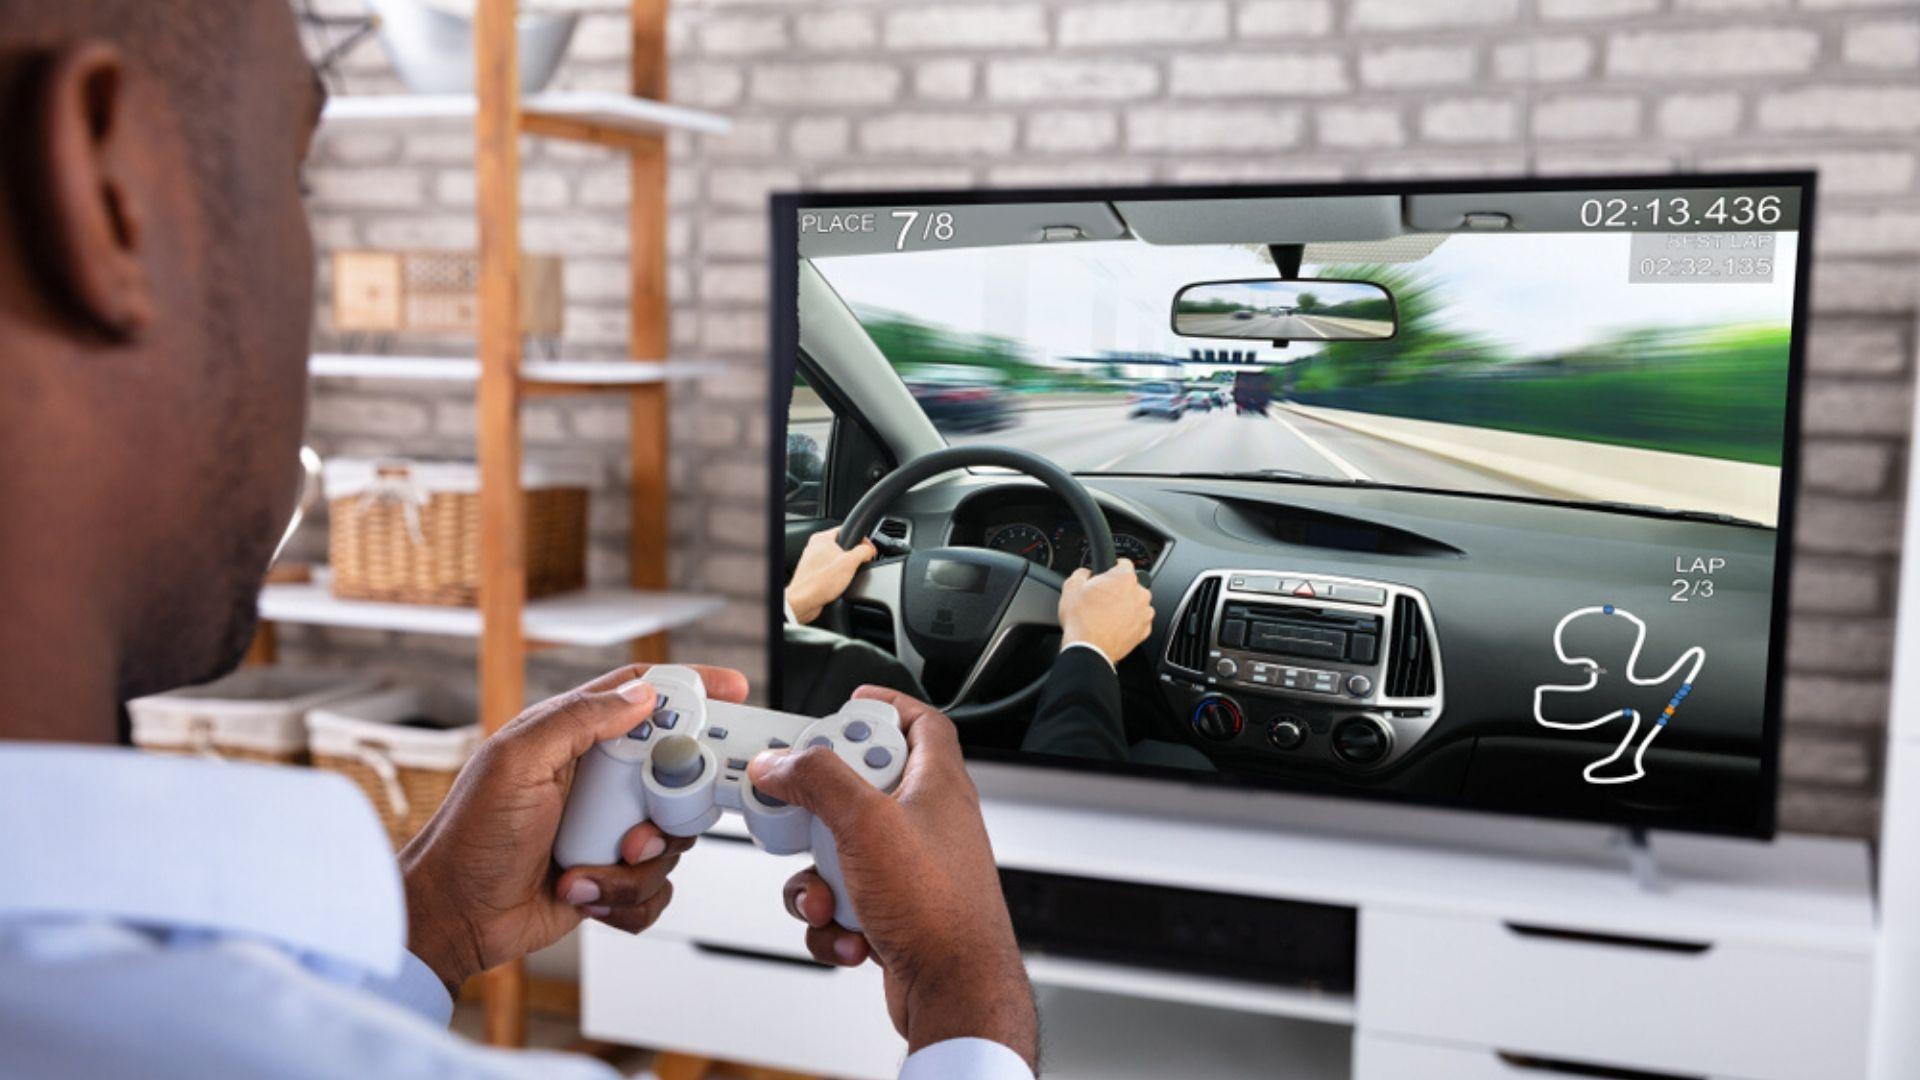 O que é Freesync? Entenda a tecnologia das novas Smart TVs Samsung